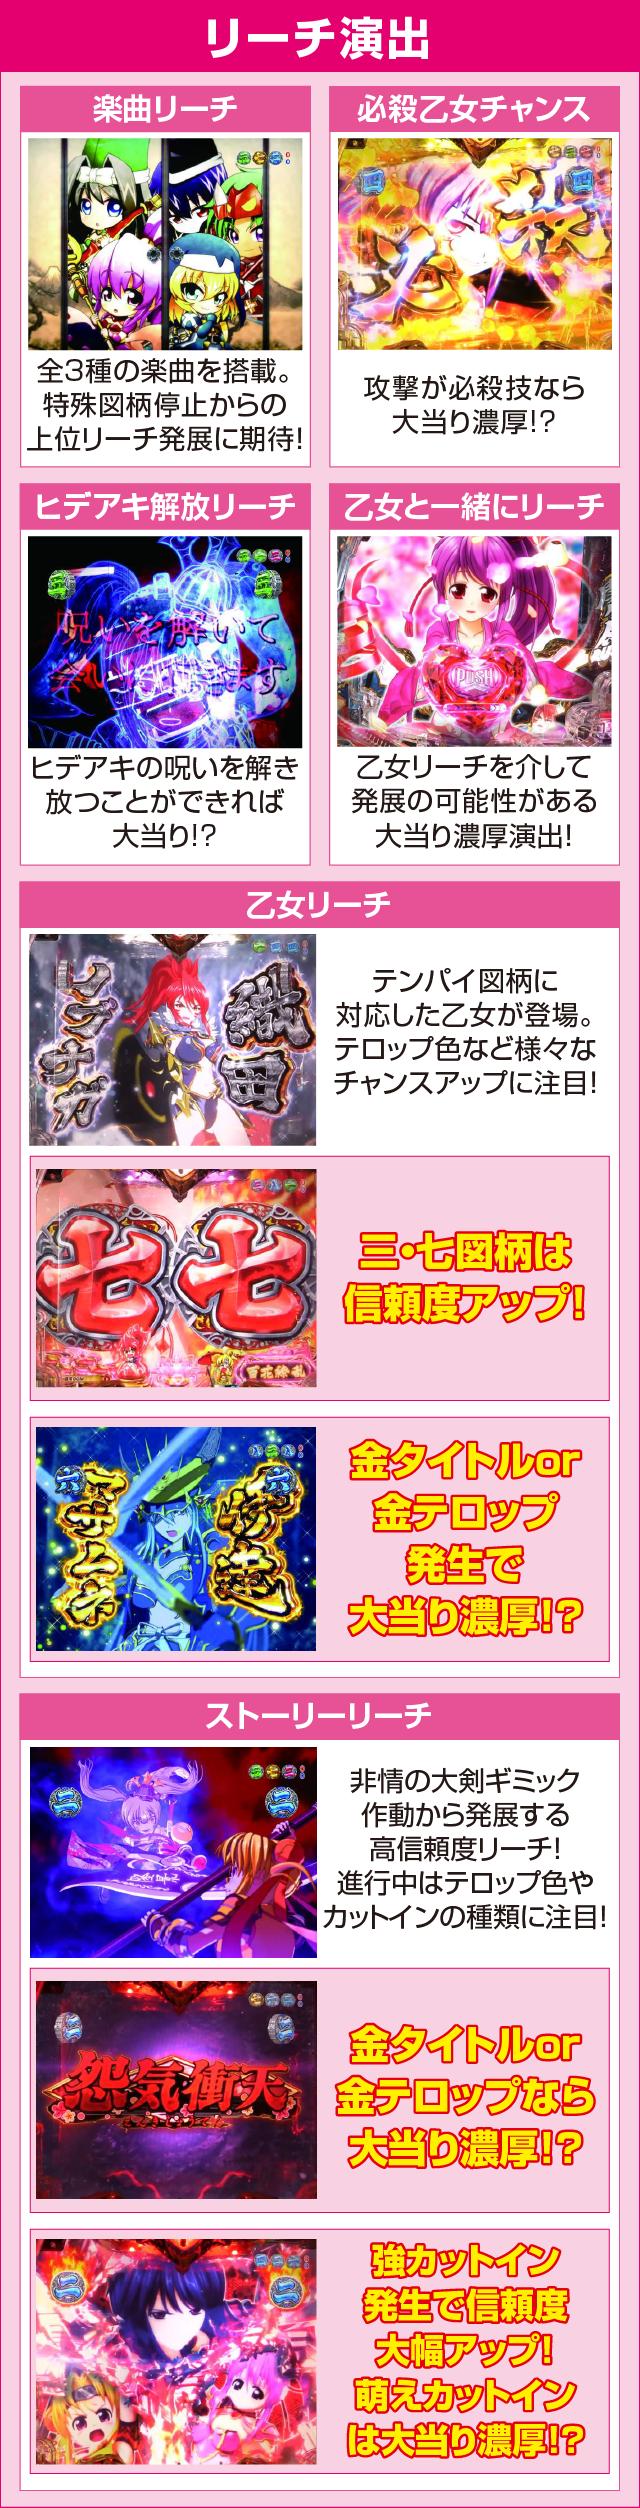 P戦国乙女6~暁の関ヶ原~甘デジのピックアップポイント